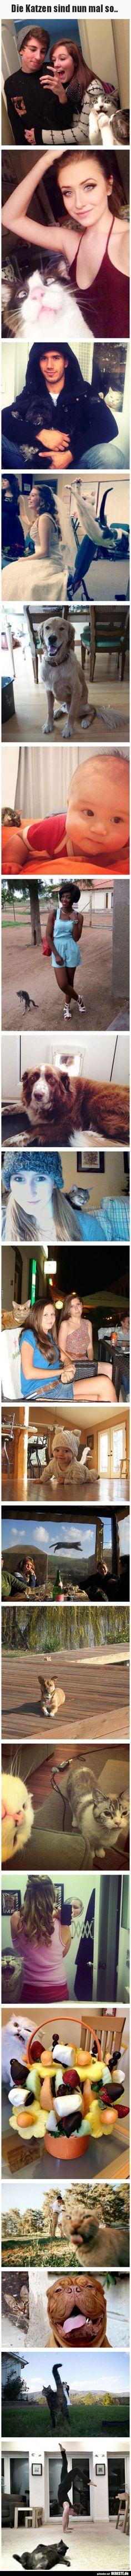 20 Funny Cat Photobombs To Make You Smile - jajaja gatos. Cute Funny Animals, Funny Cute, Cute Cats, Hilarious, Funny Jokes, Super Funny, Funny Minion, Funny Cat Photos, Funny Animal Pictures